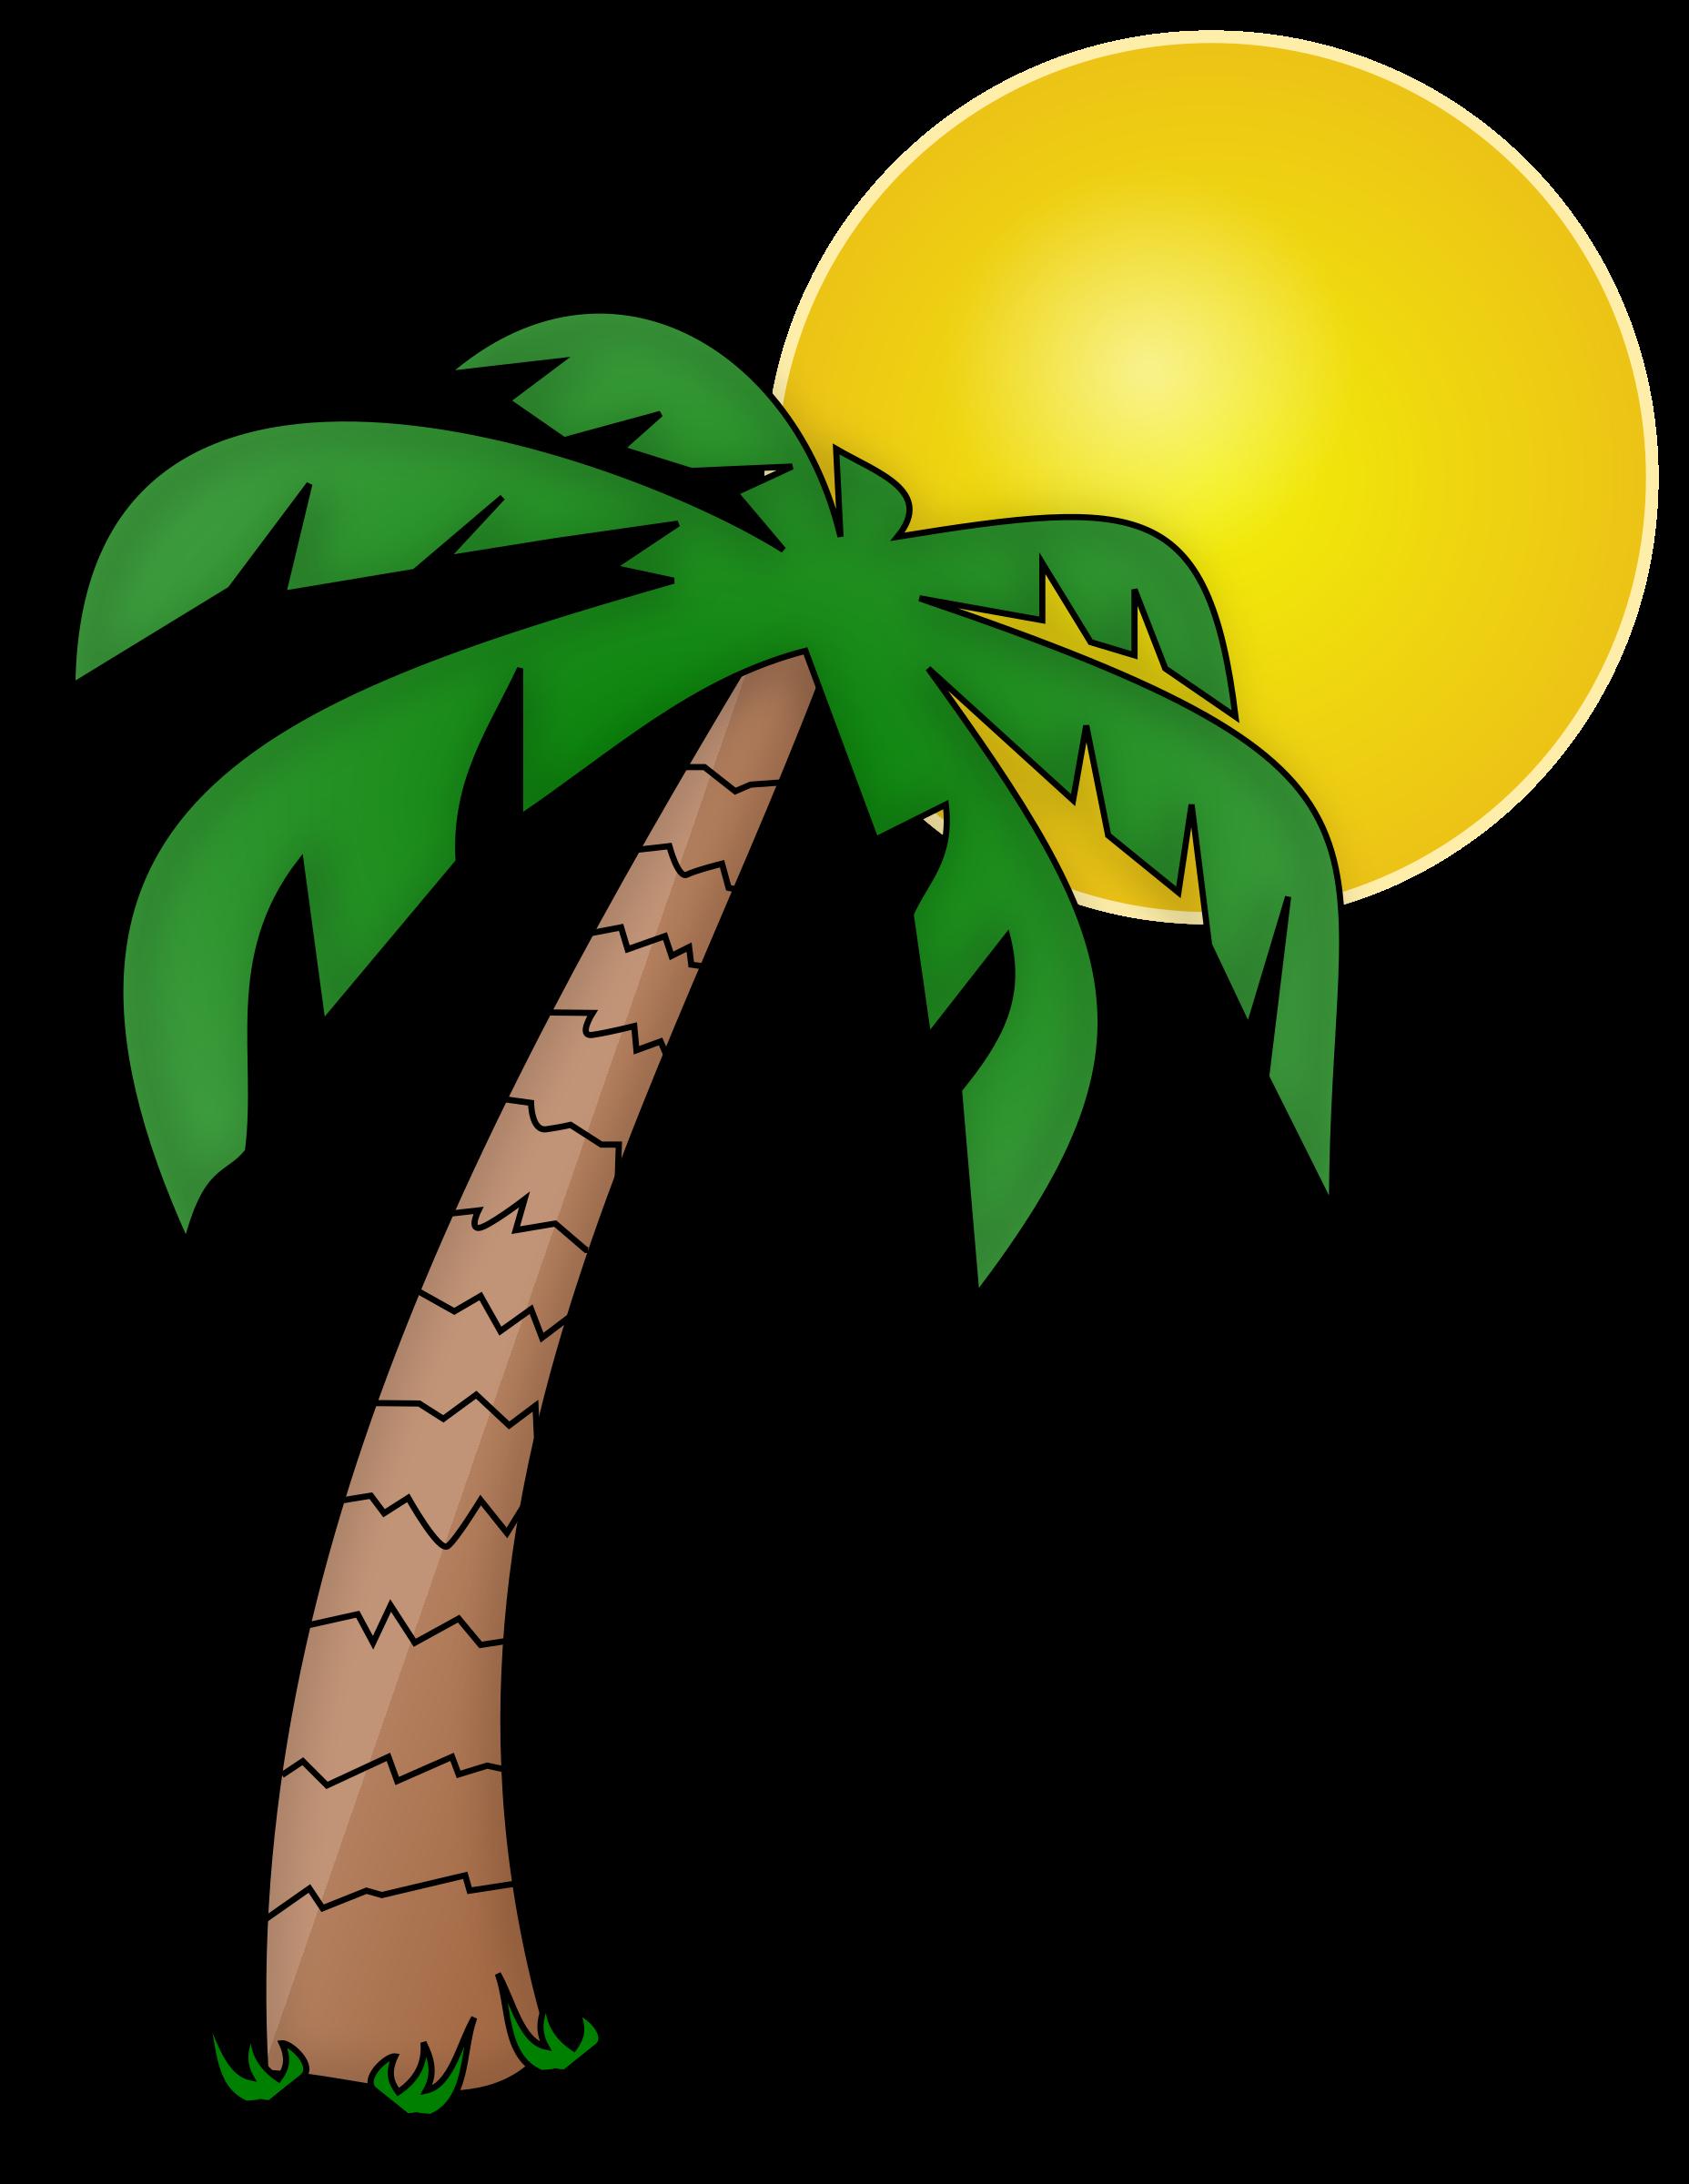 Languagebites of the week. Palm clipart palm florida trees